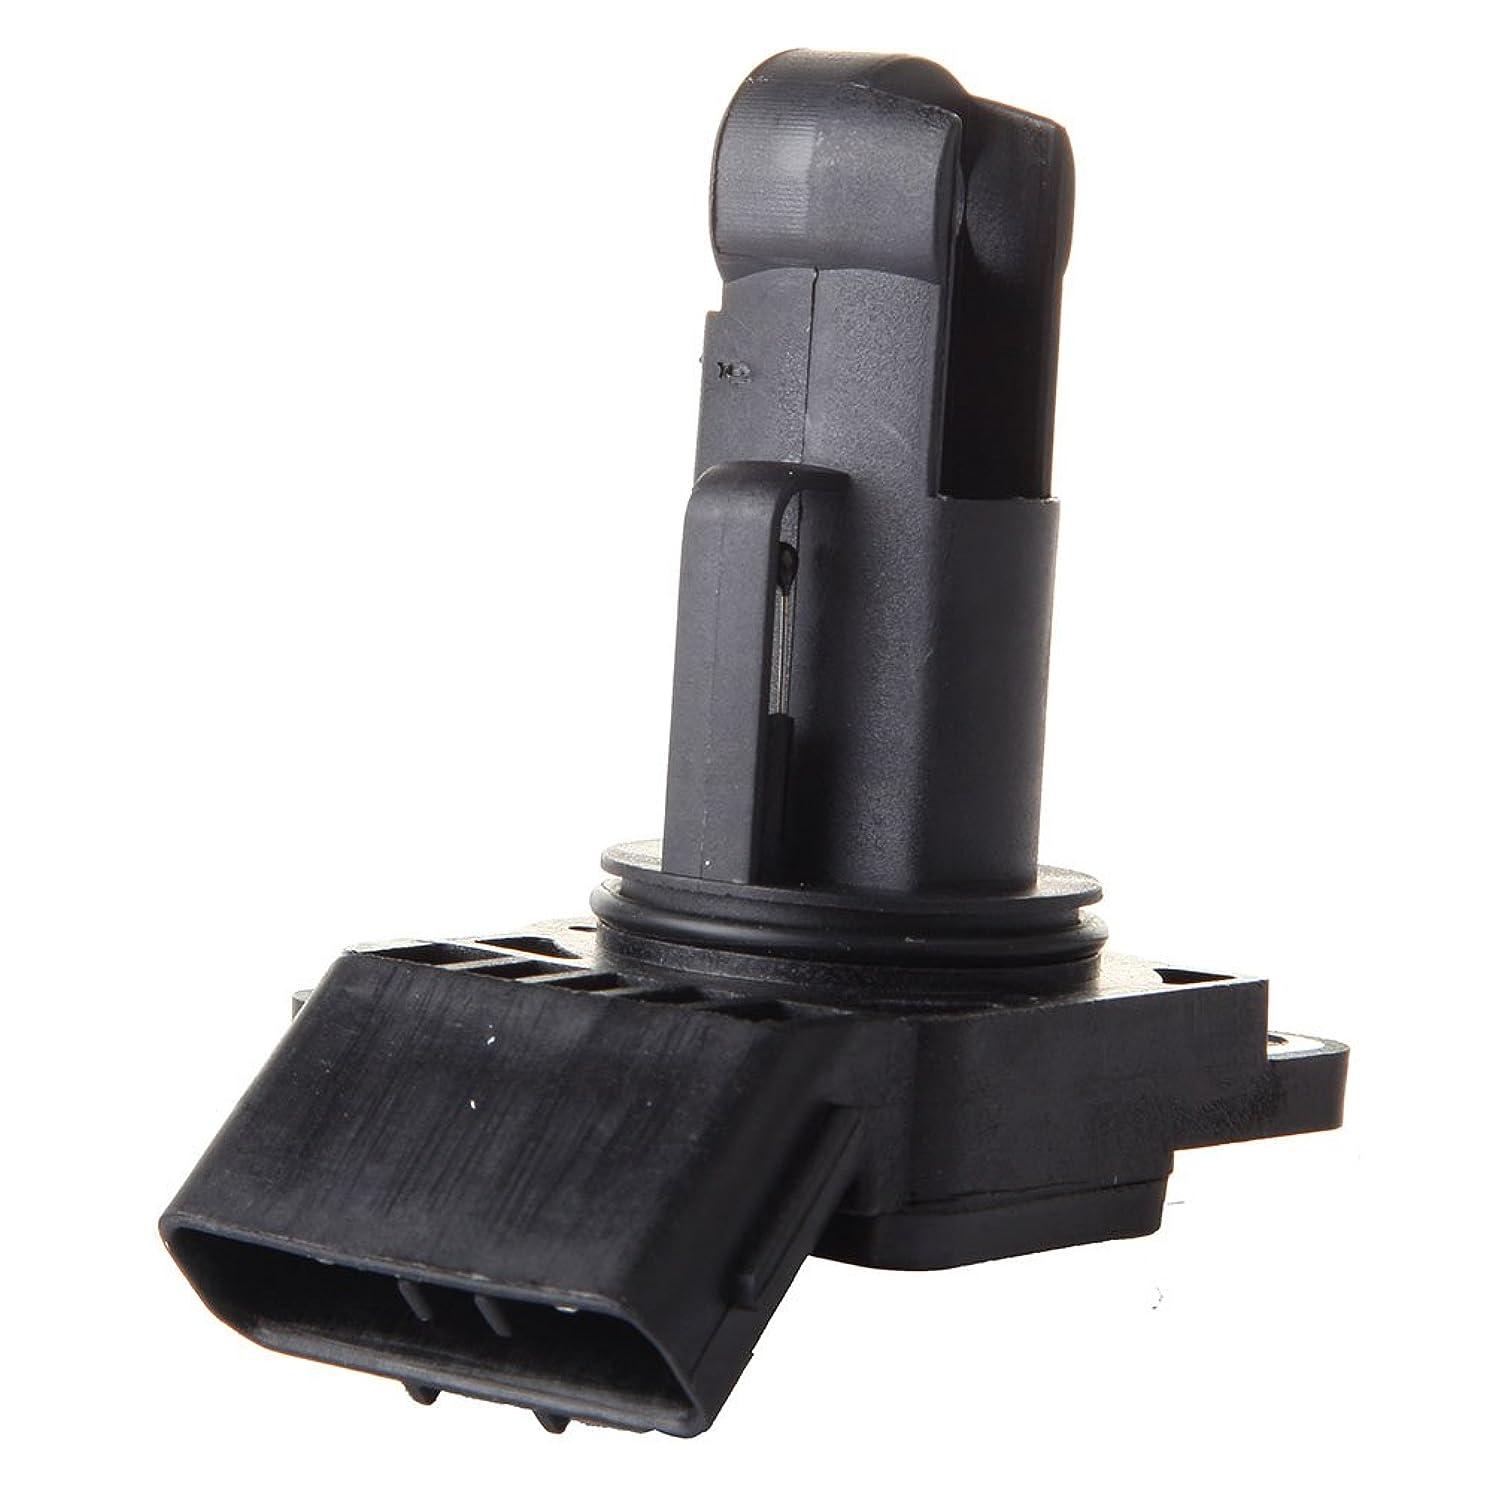 SCITOO Mass Air Flow Sensor Meter MAF 2220415010 222040D010 Fit Toyota Corolla Chevrolet Geo Prizm 1.8L 2000 2001 2002